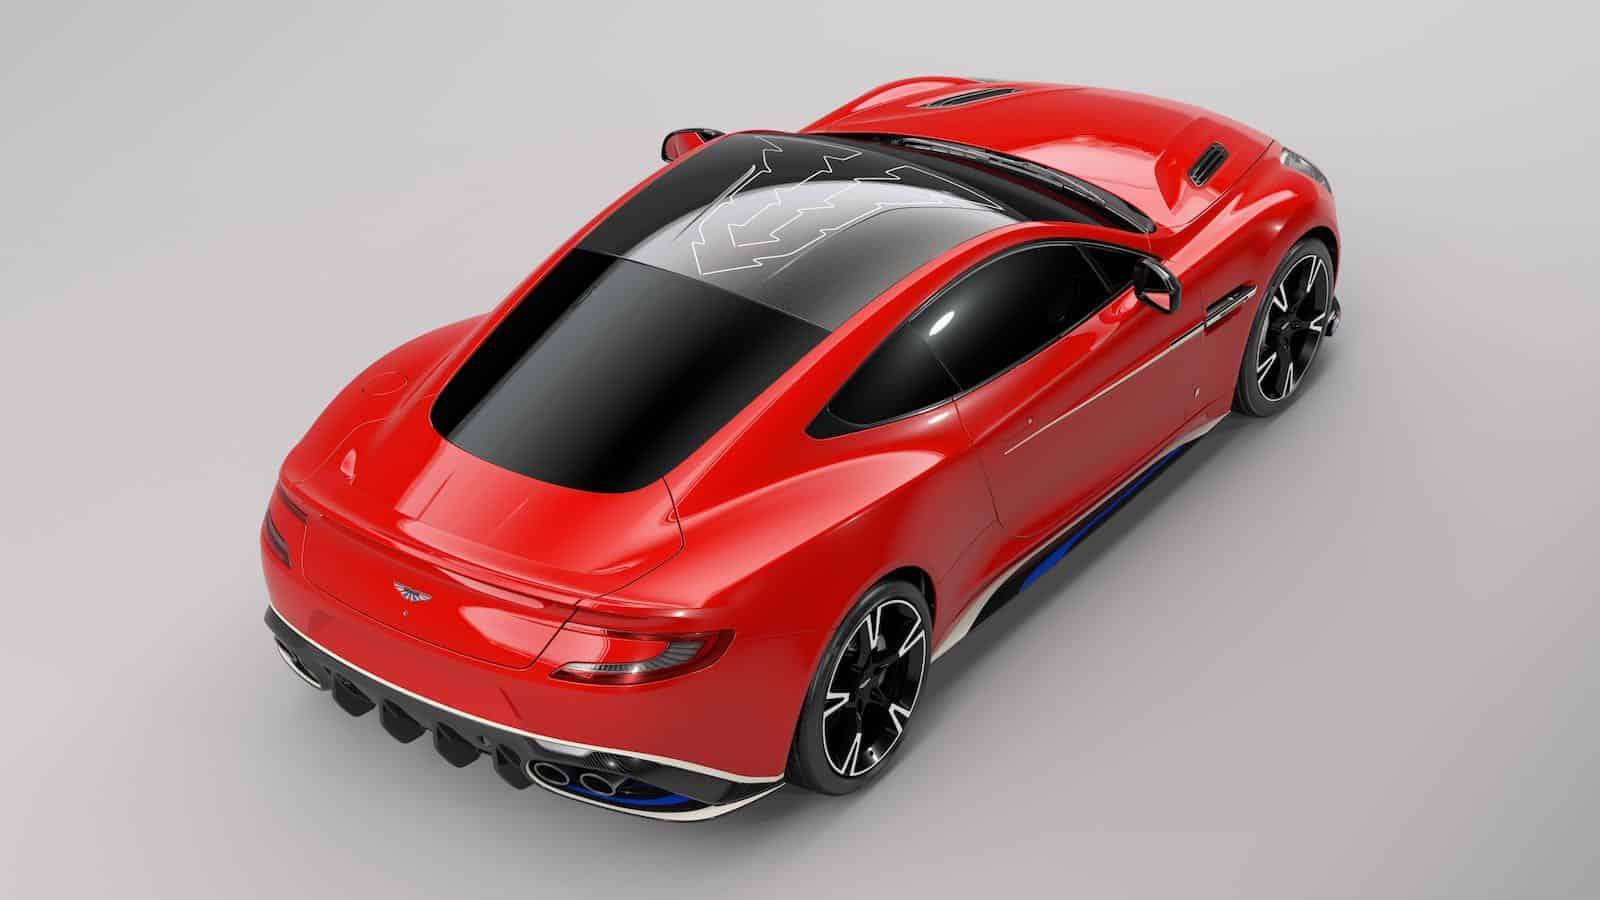 Aston Martin Vanquish S Red Arrows Edition por Q